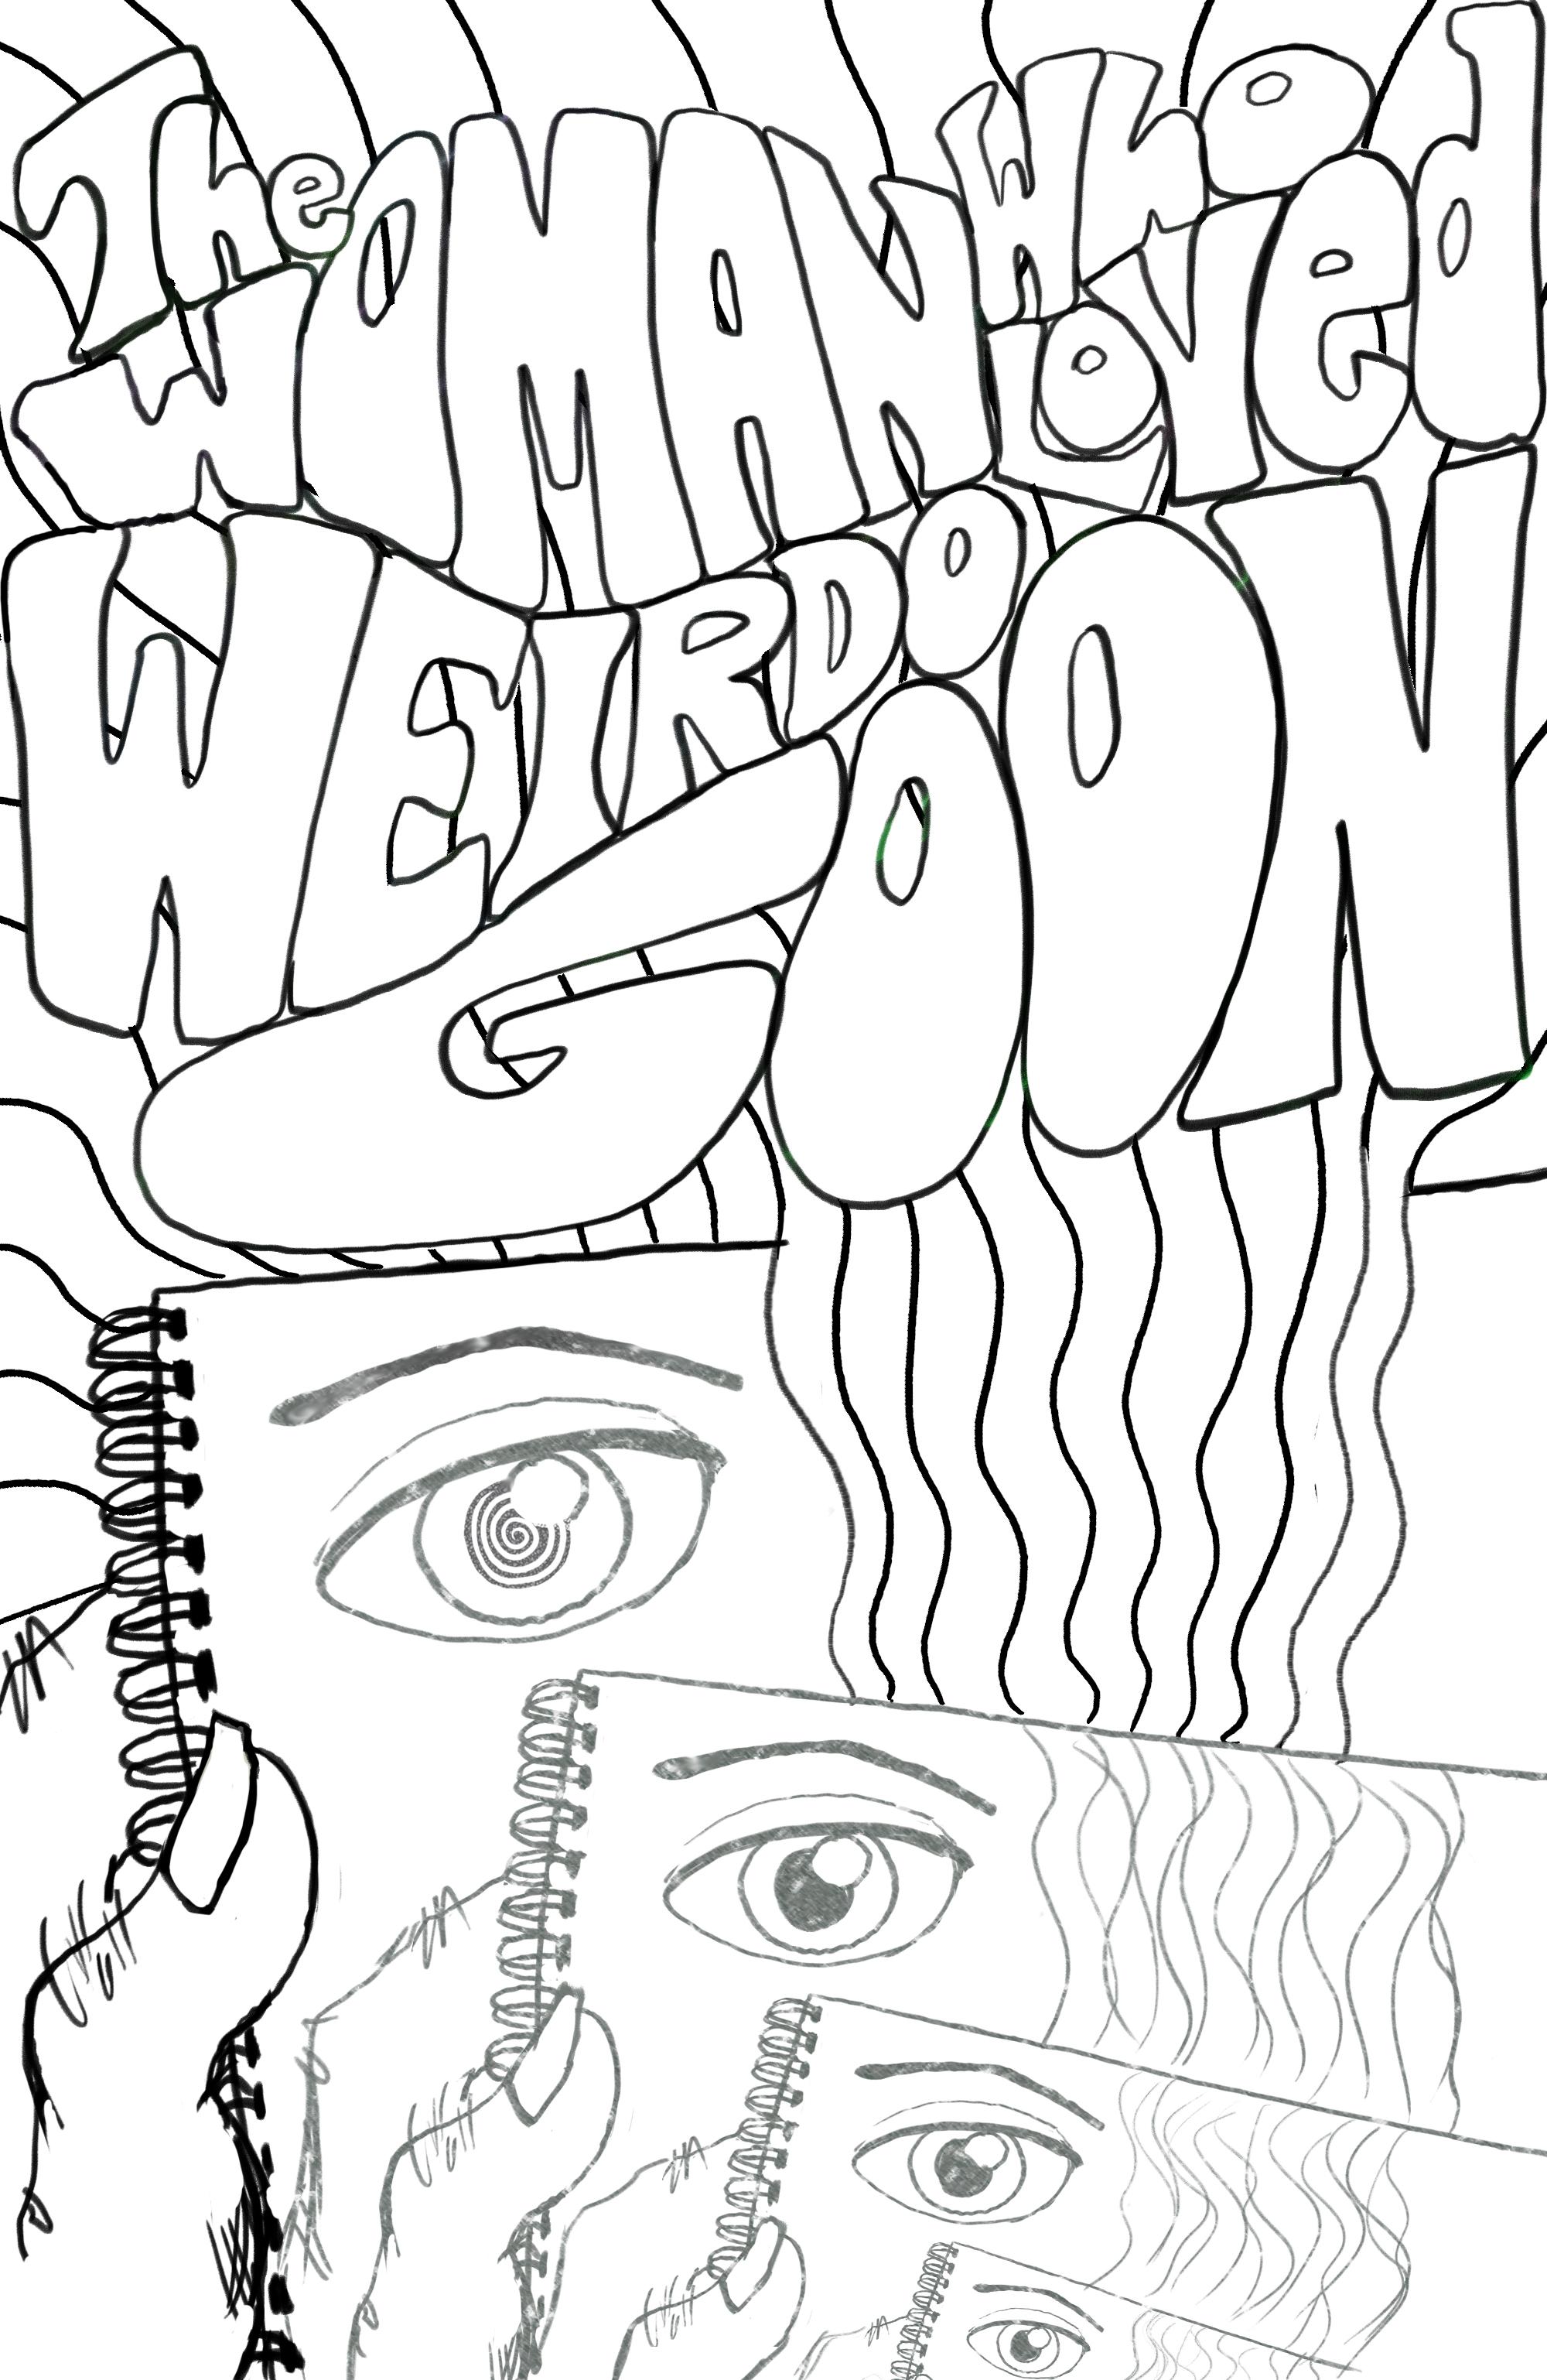 The Woman Who Loved Weirdo Goon (2017)